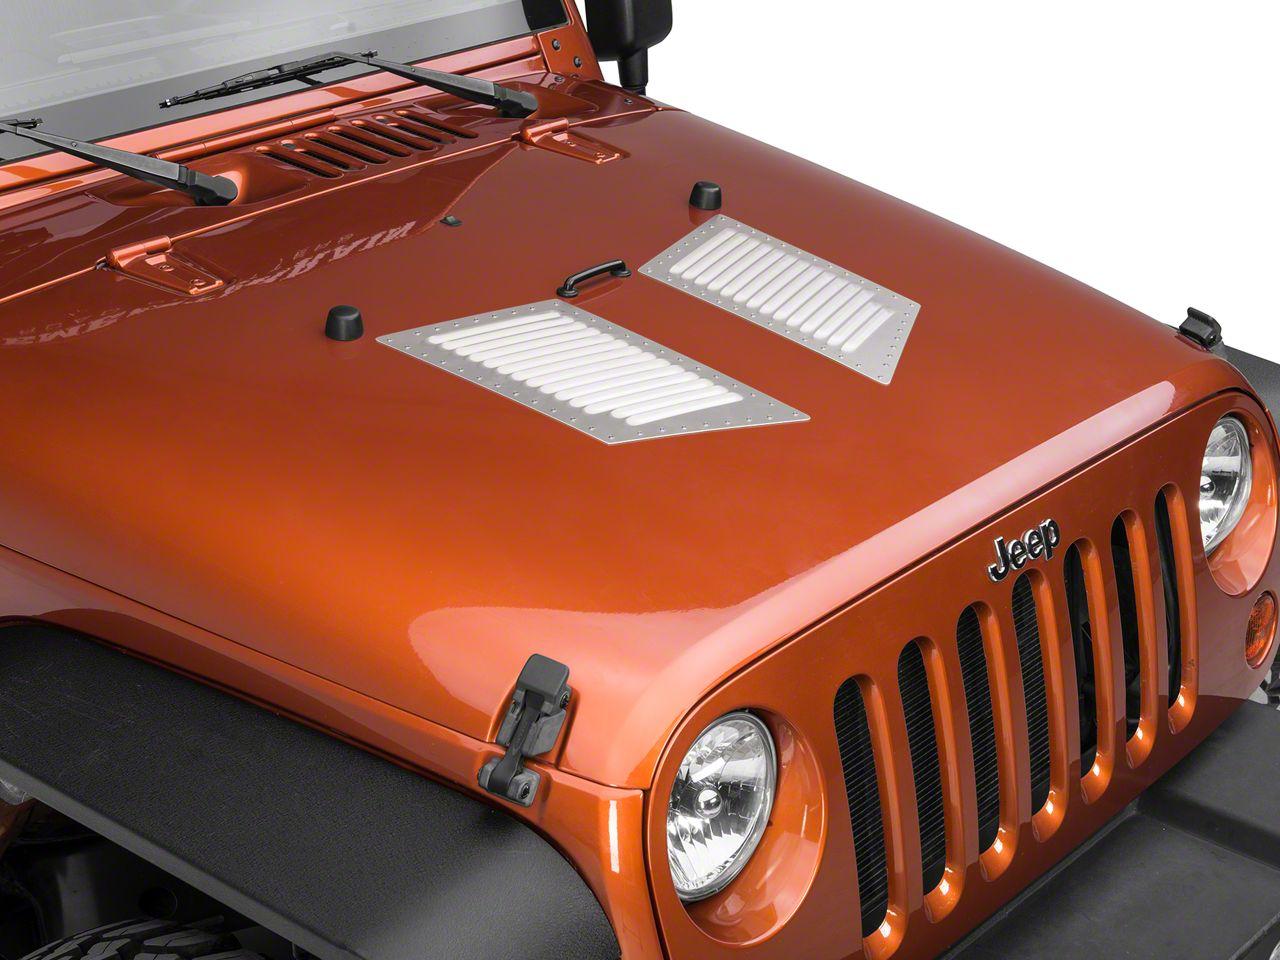 RedRock 4x4 Medium Hi-Flow Louvers - Natural Aluminum w/ Stainless Rivets (87-19 Jeep Wrangler YJ, TJ, JK & JL)